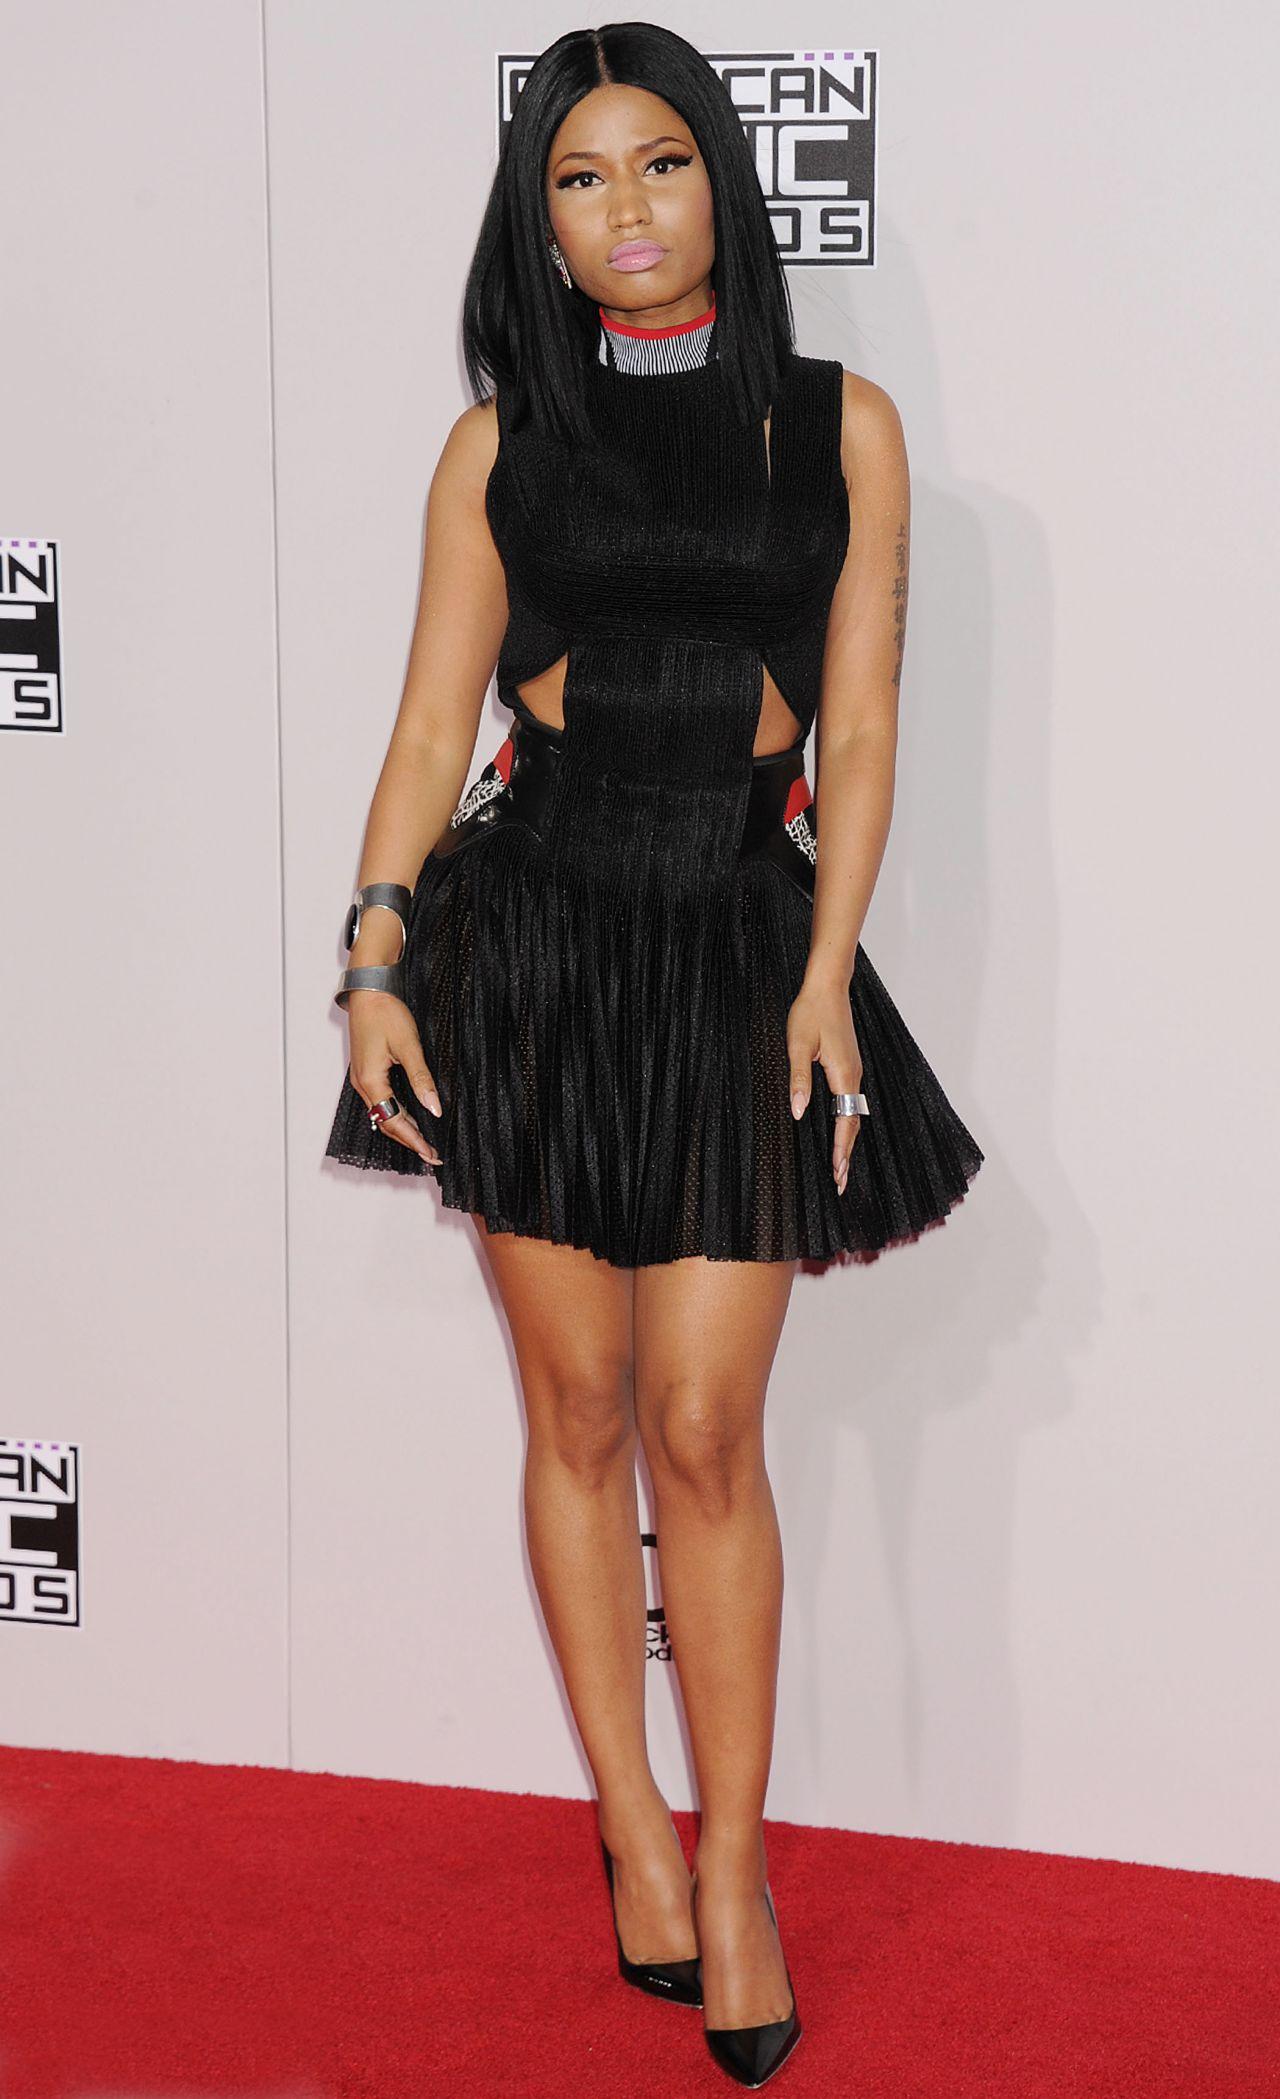 Nicki Minaj Red Carpet Photos - 2014 American Music Awards ...